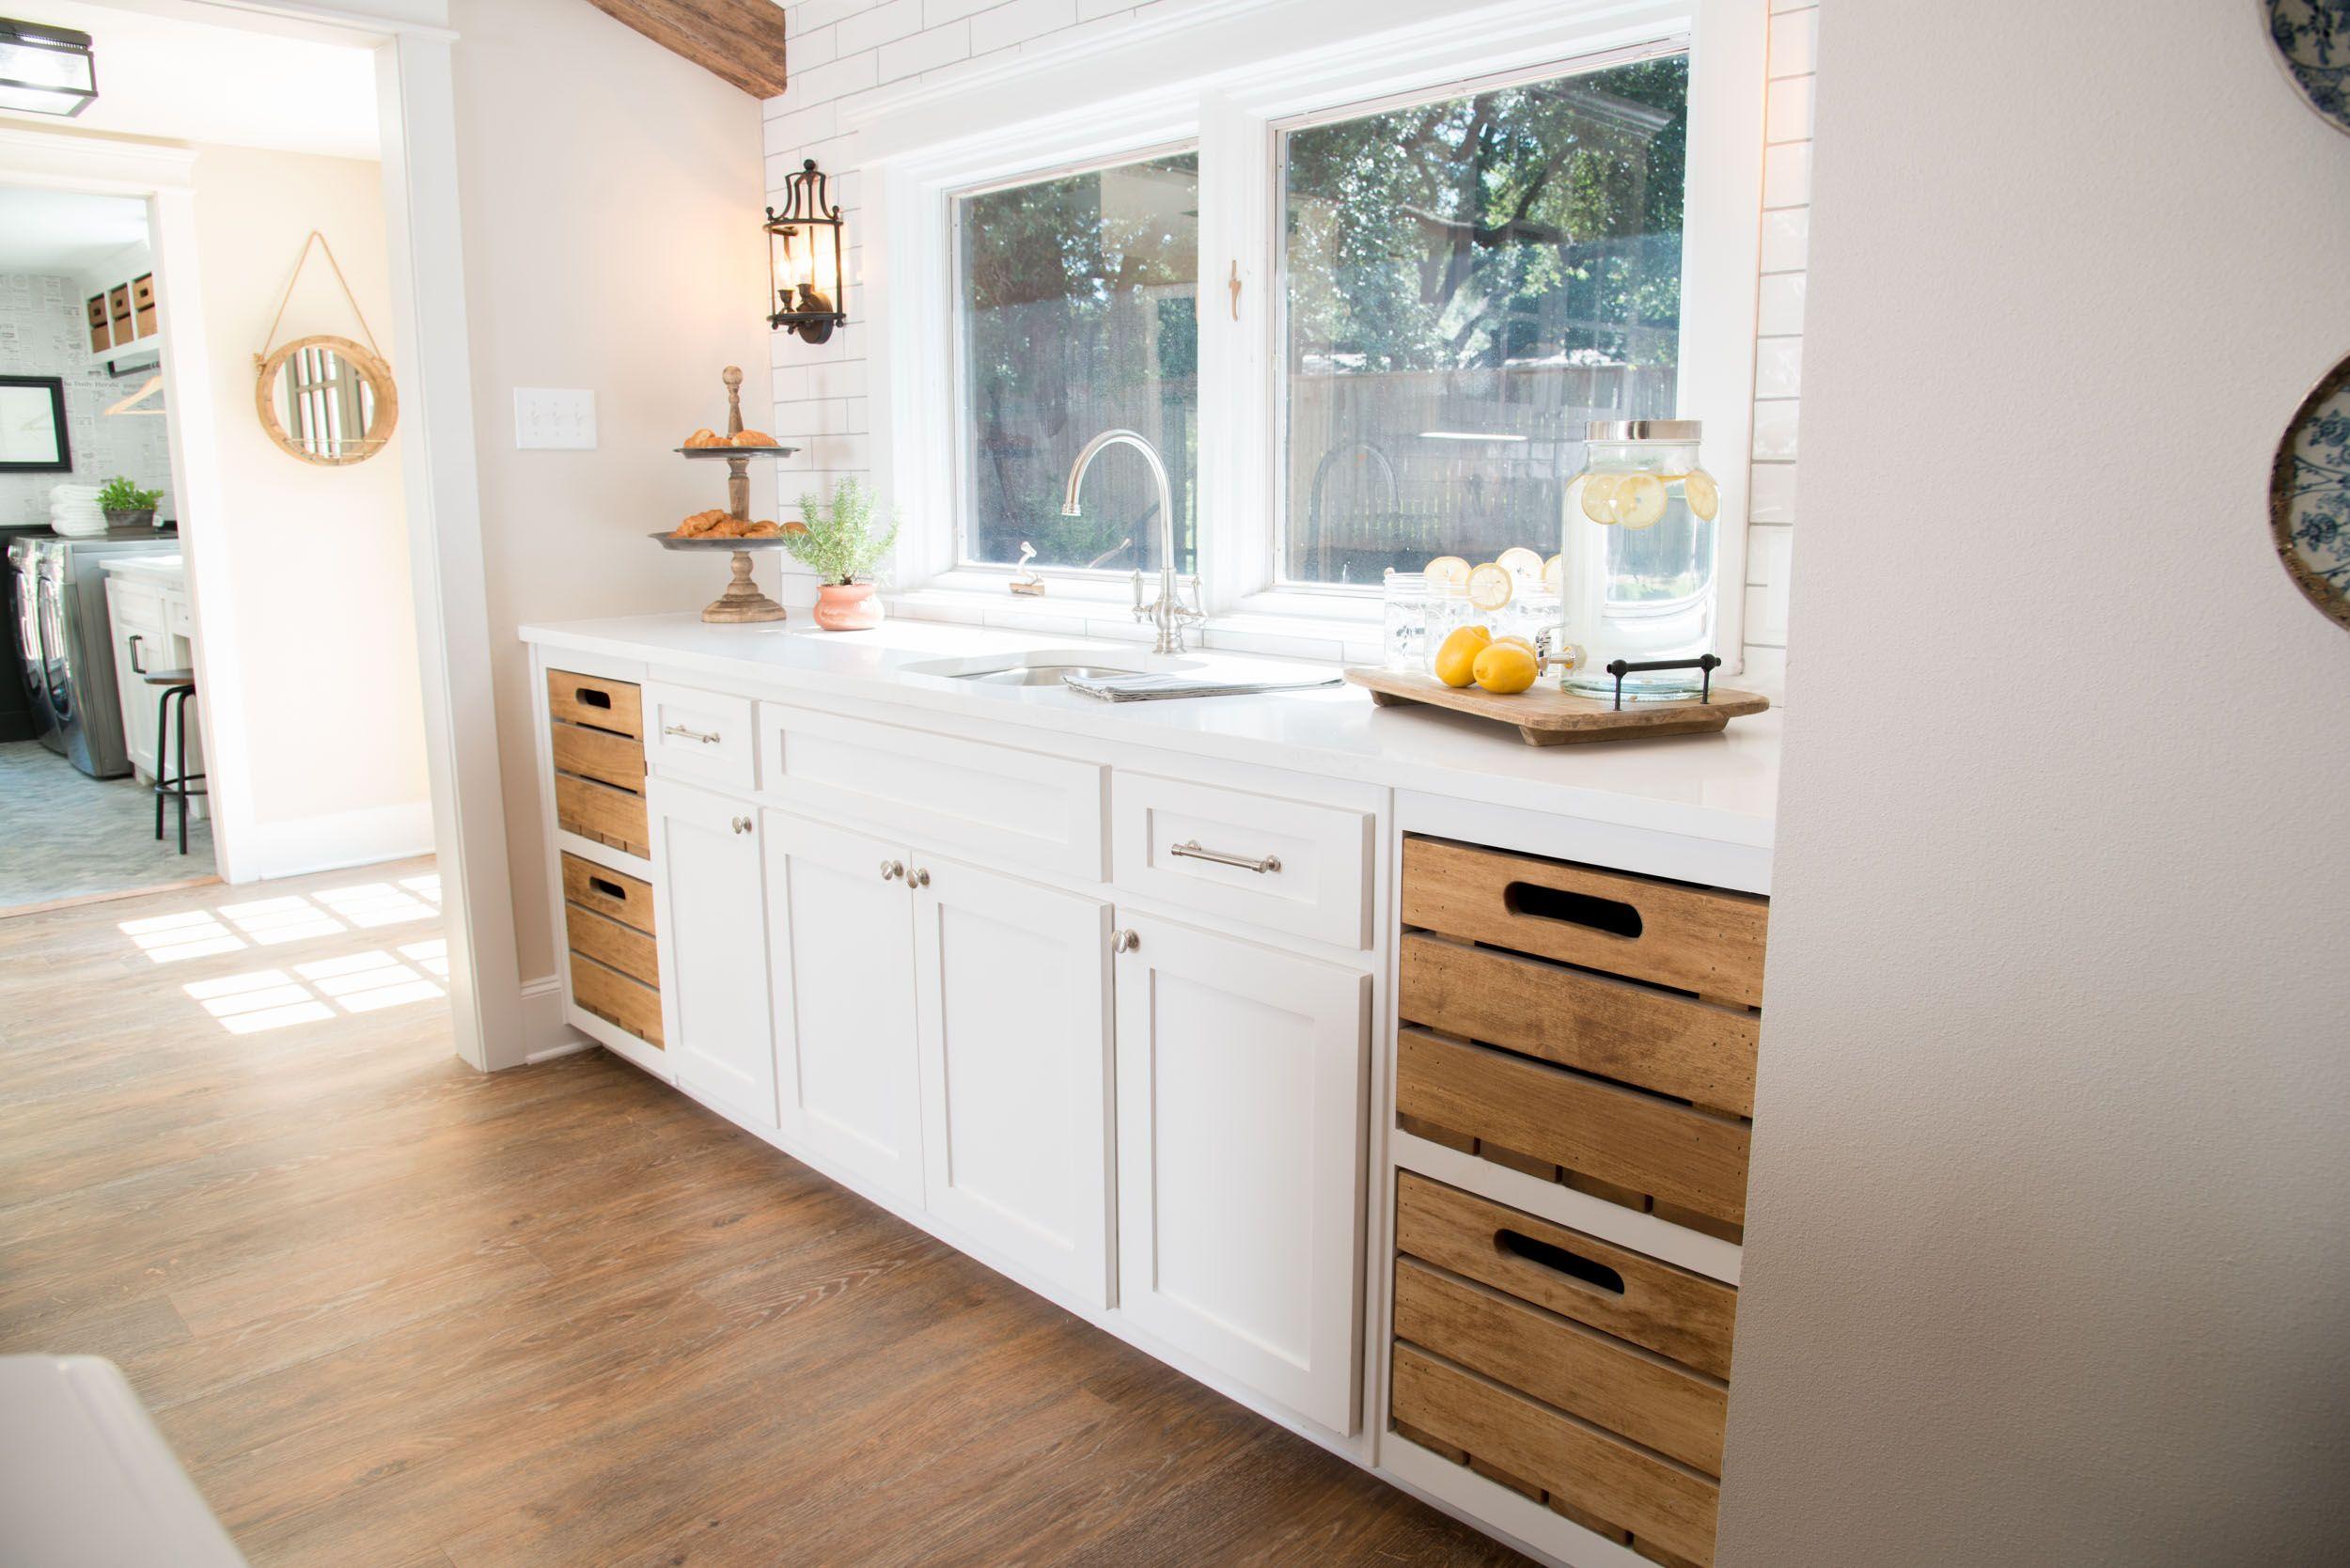 Fixer upper kitchens season 4 - The Cargo Ship House Season 4 Fixer Upper Magnolia Market Kitchen